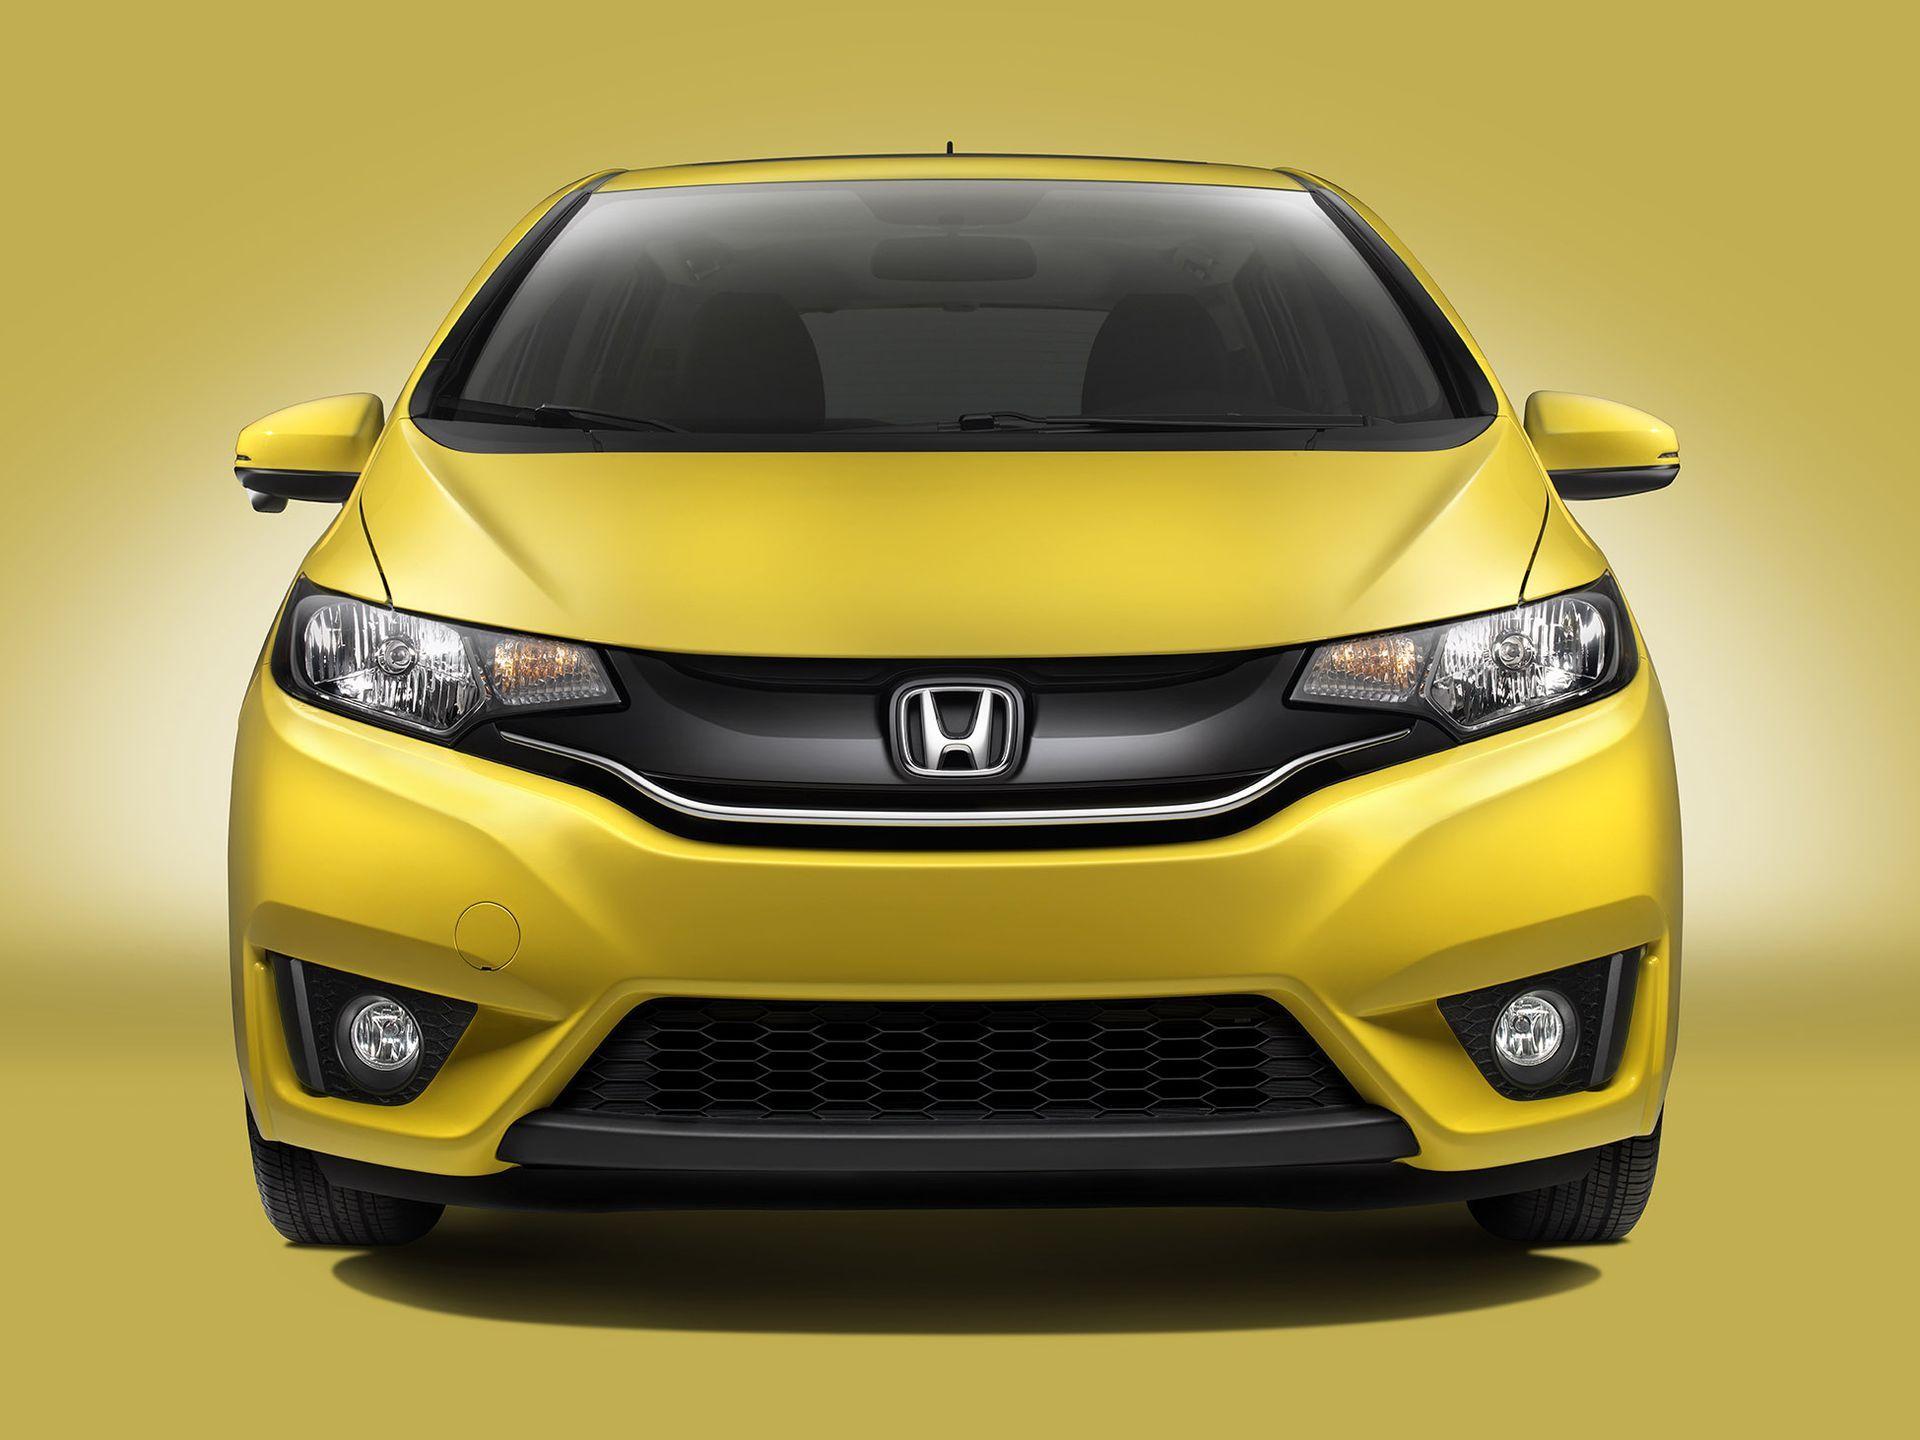 Honda S 2015 Fit A Small Car With Big Dreams Honda Fit 2015 Honda Fit Honda Jazz